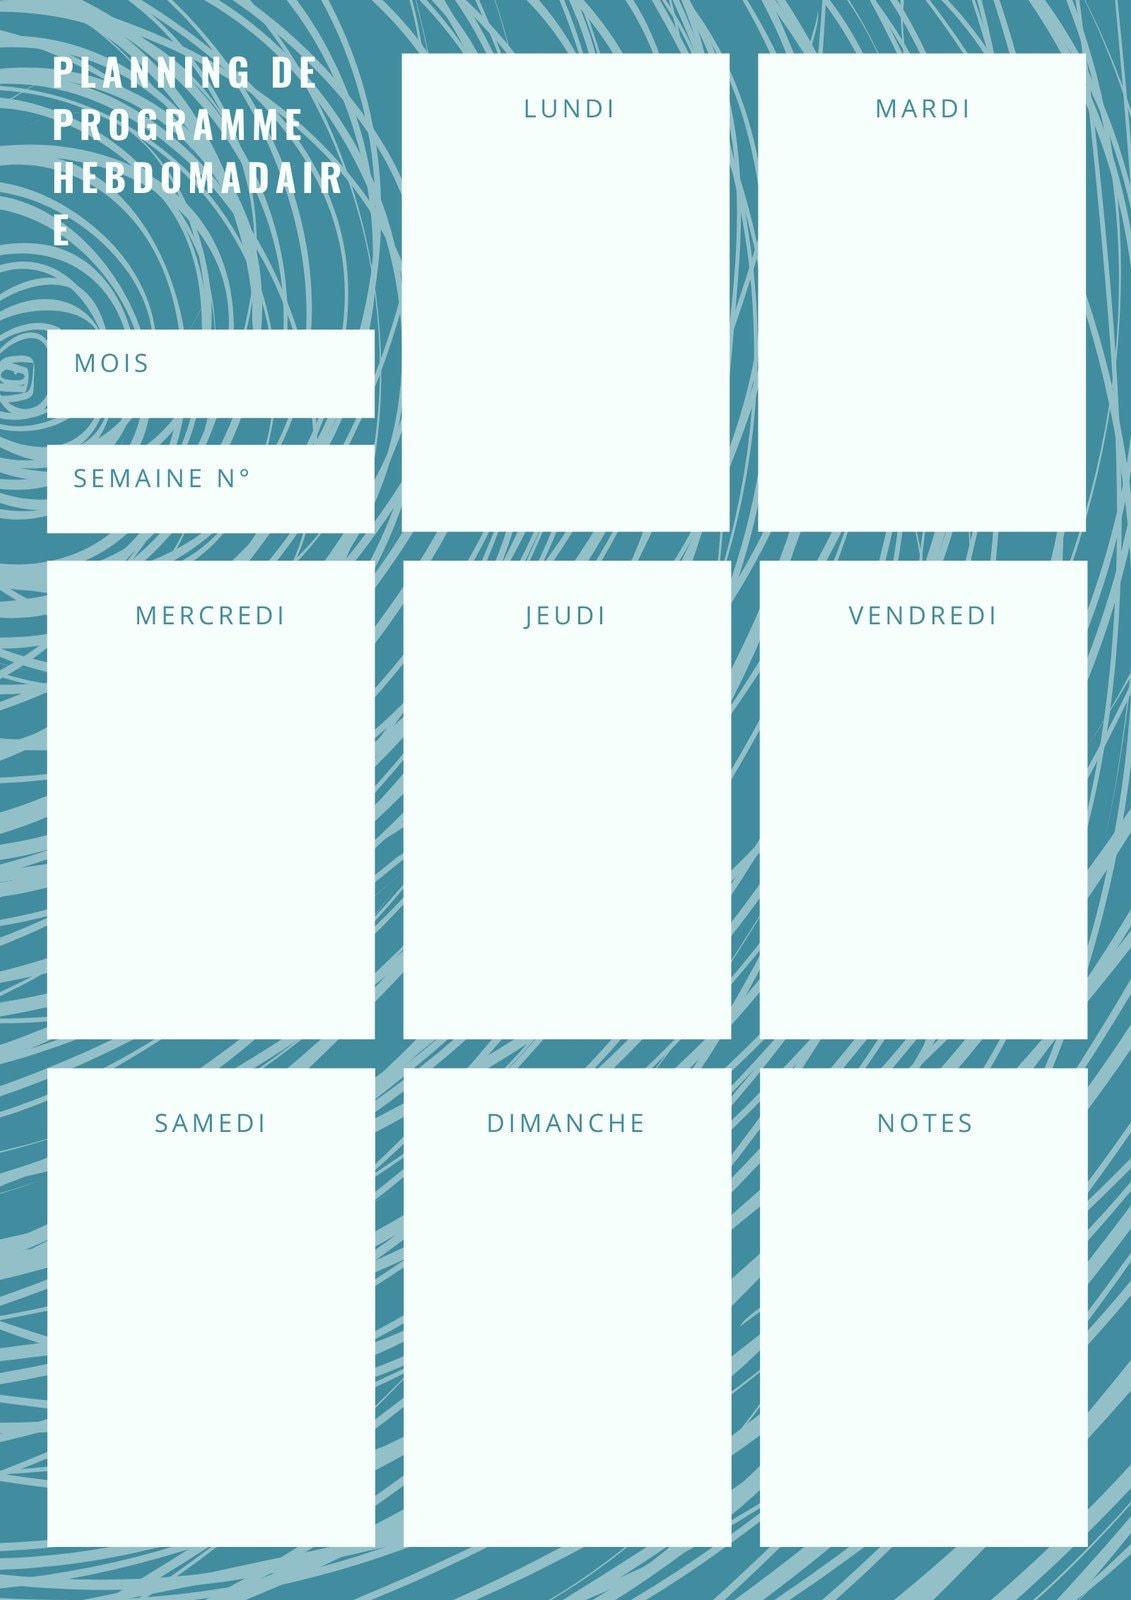 Bleu Vague Motif Hebdomadaire Calendrier Planning